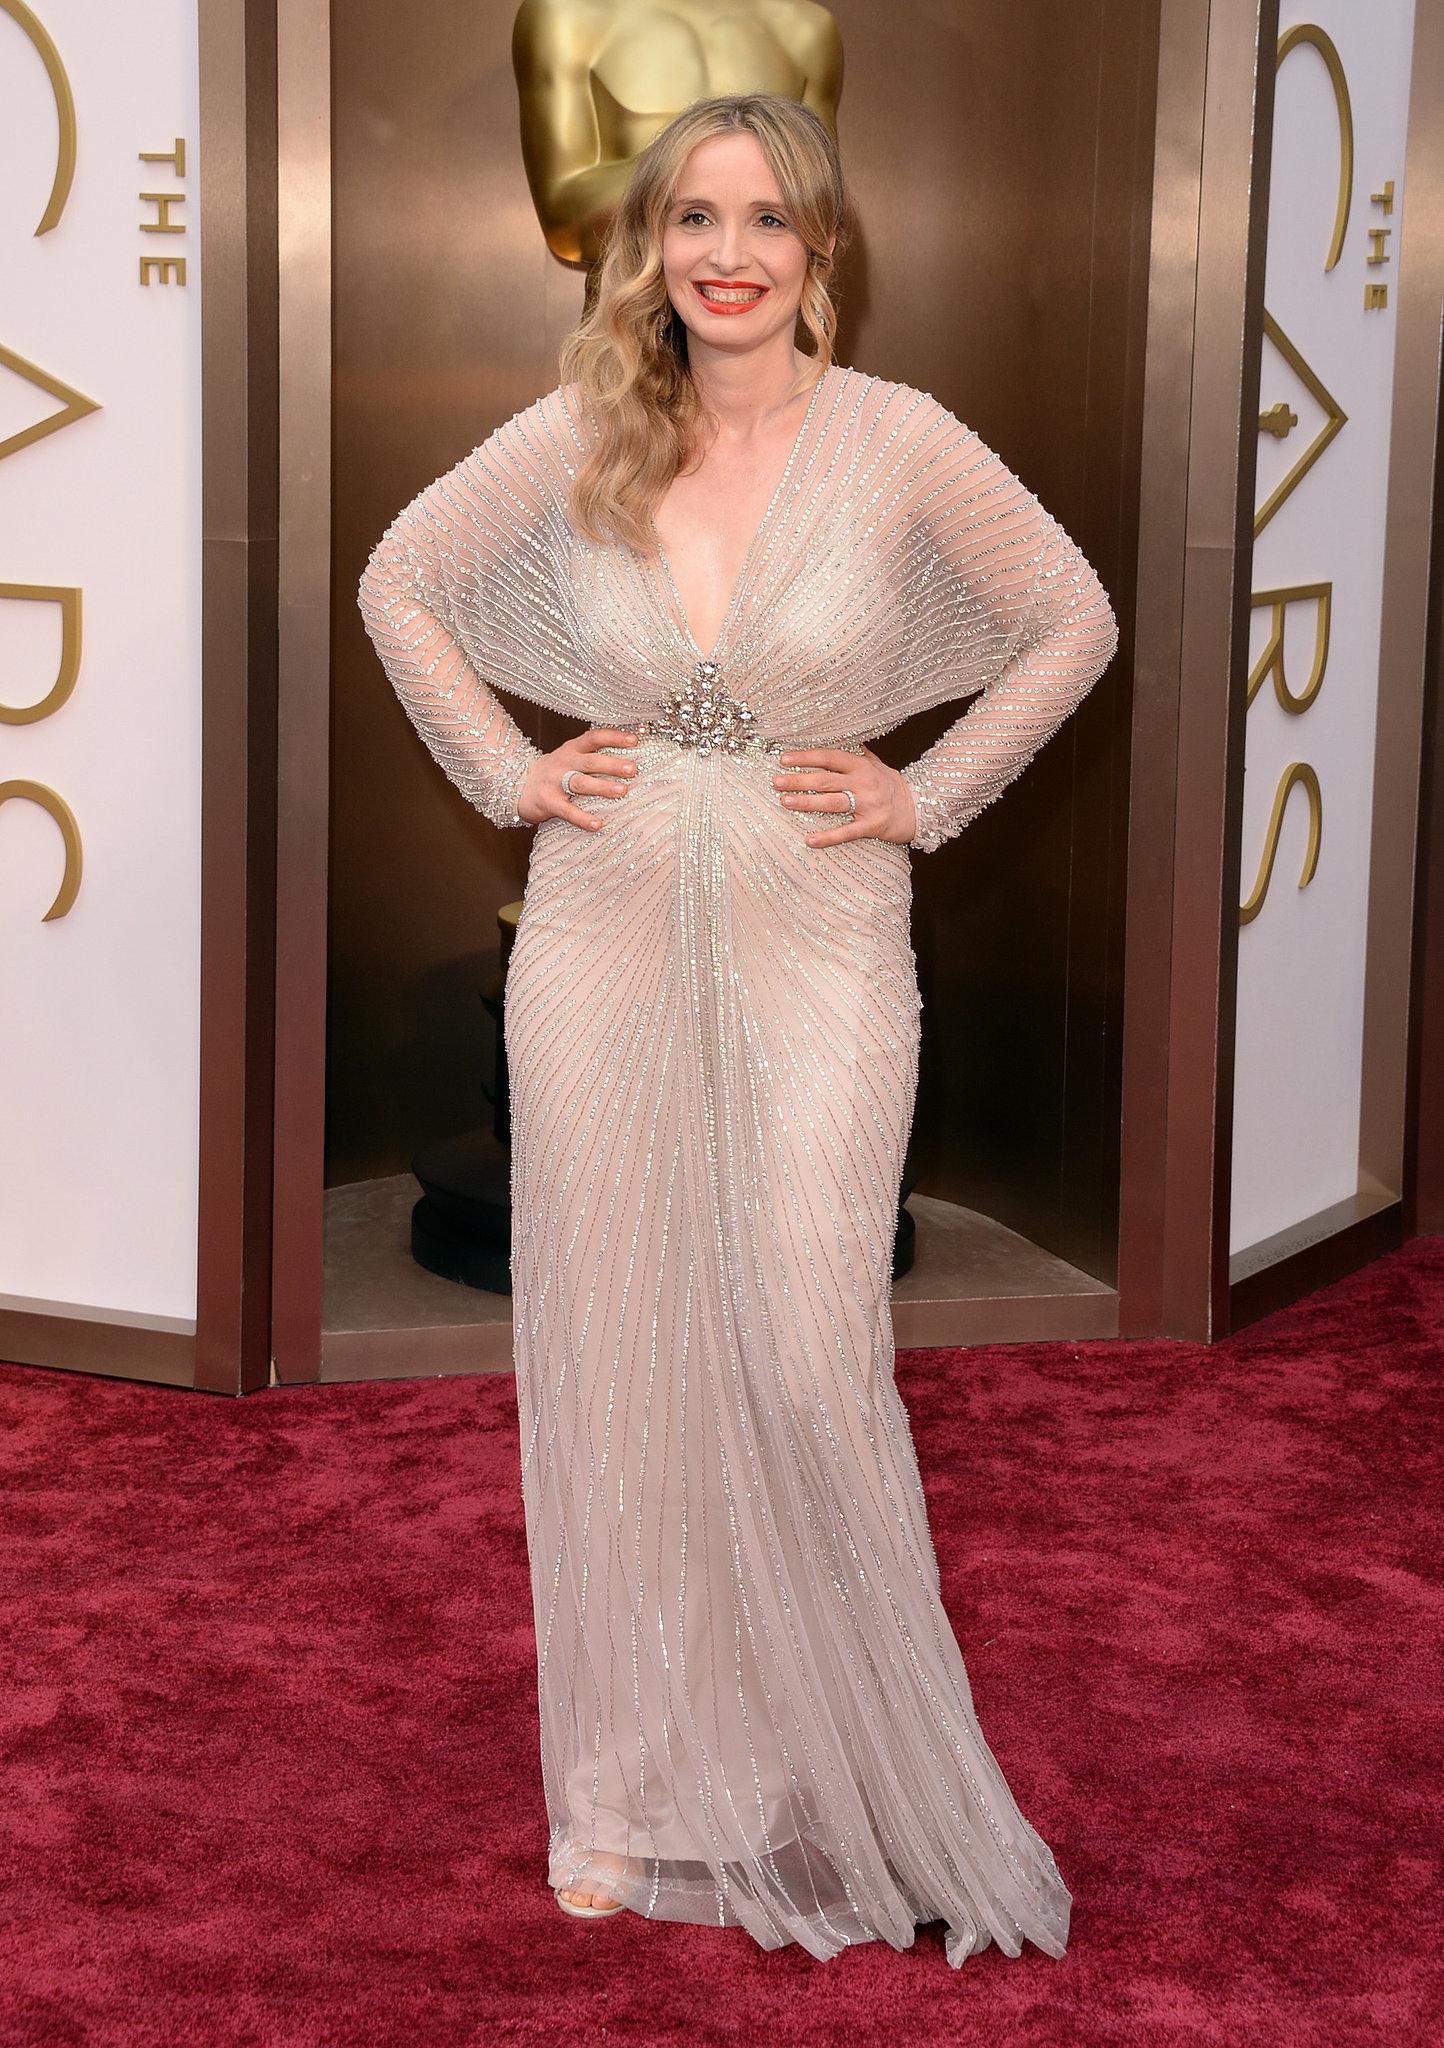 Julie Delpy at the 2014 Oscars